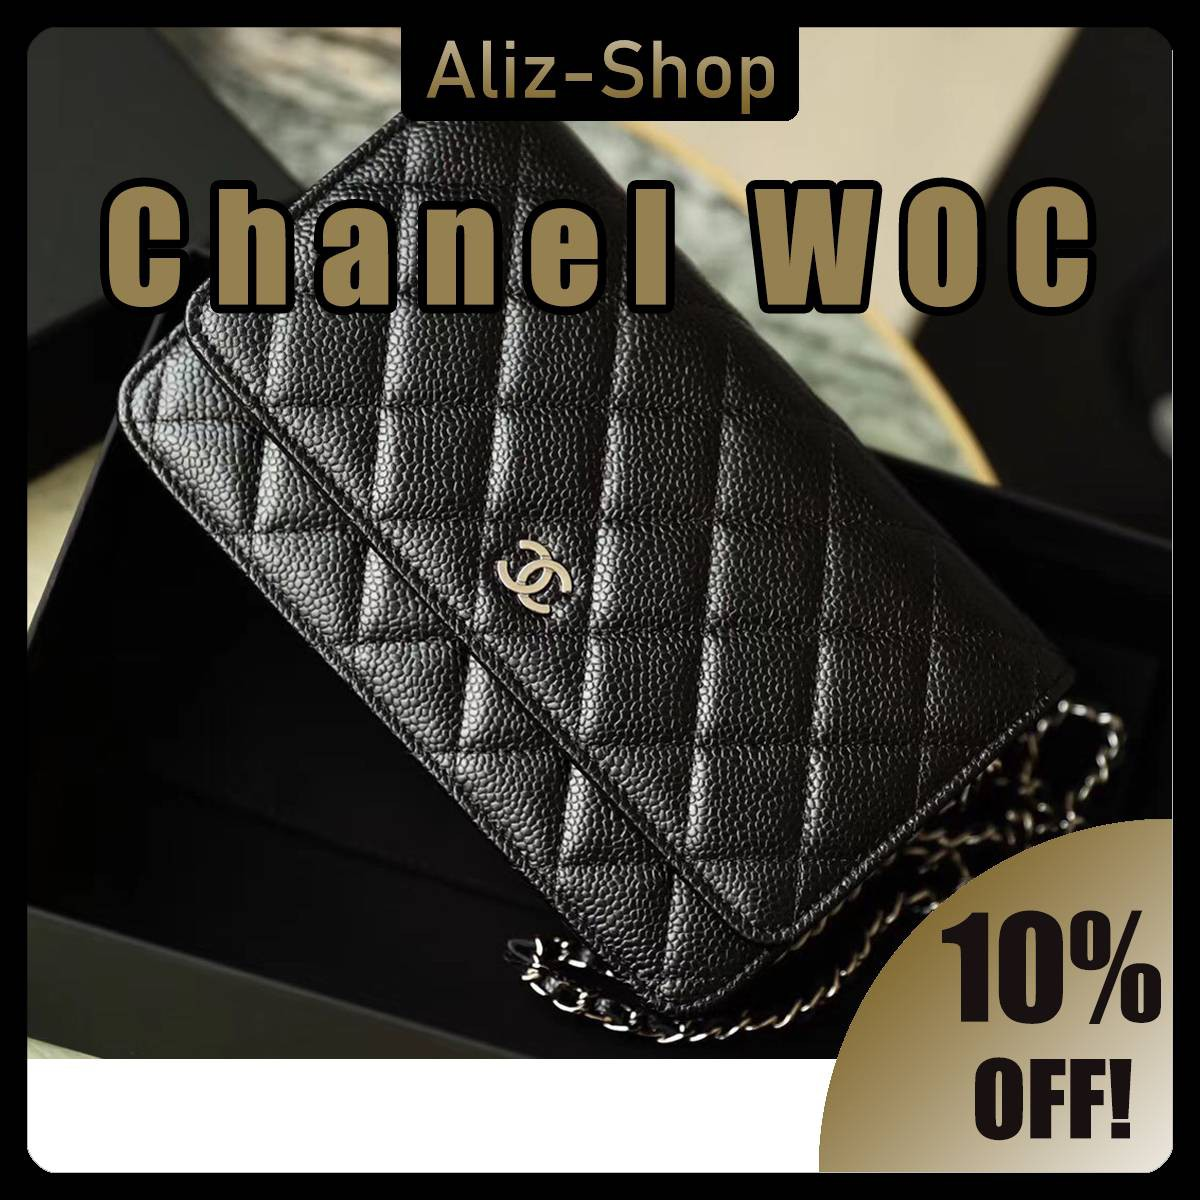 【Aliz】Chanel new✨ แท้💯 crossbody woc กระเป๋าสะพาย คลาสสิกและเข้ากับอะไรก็ได้